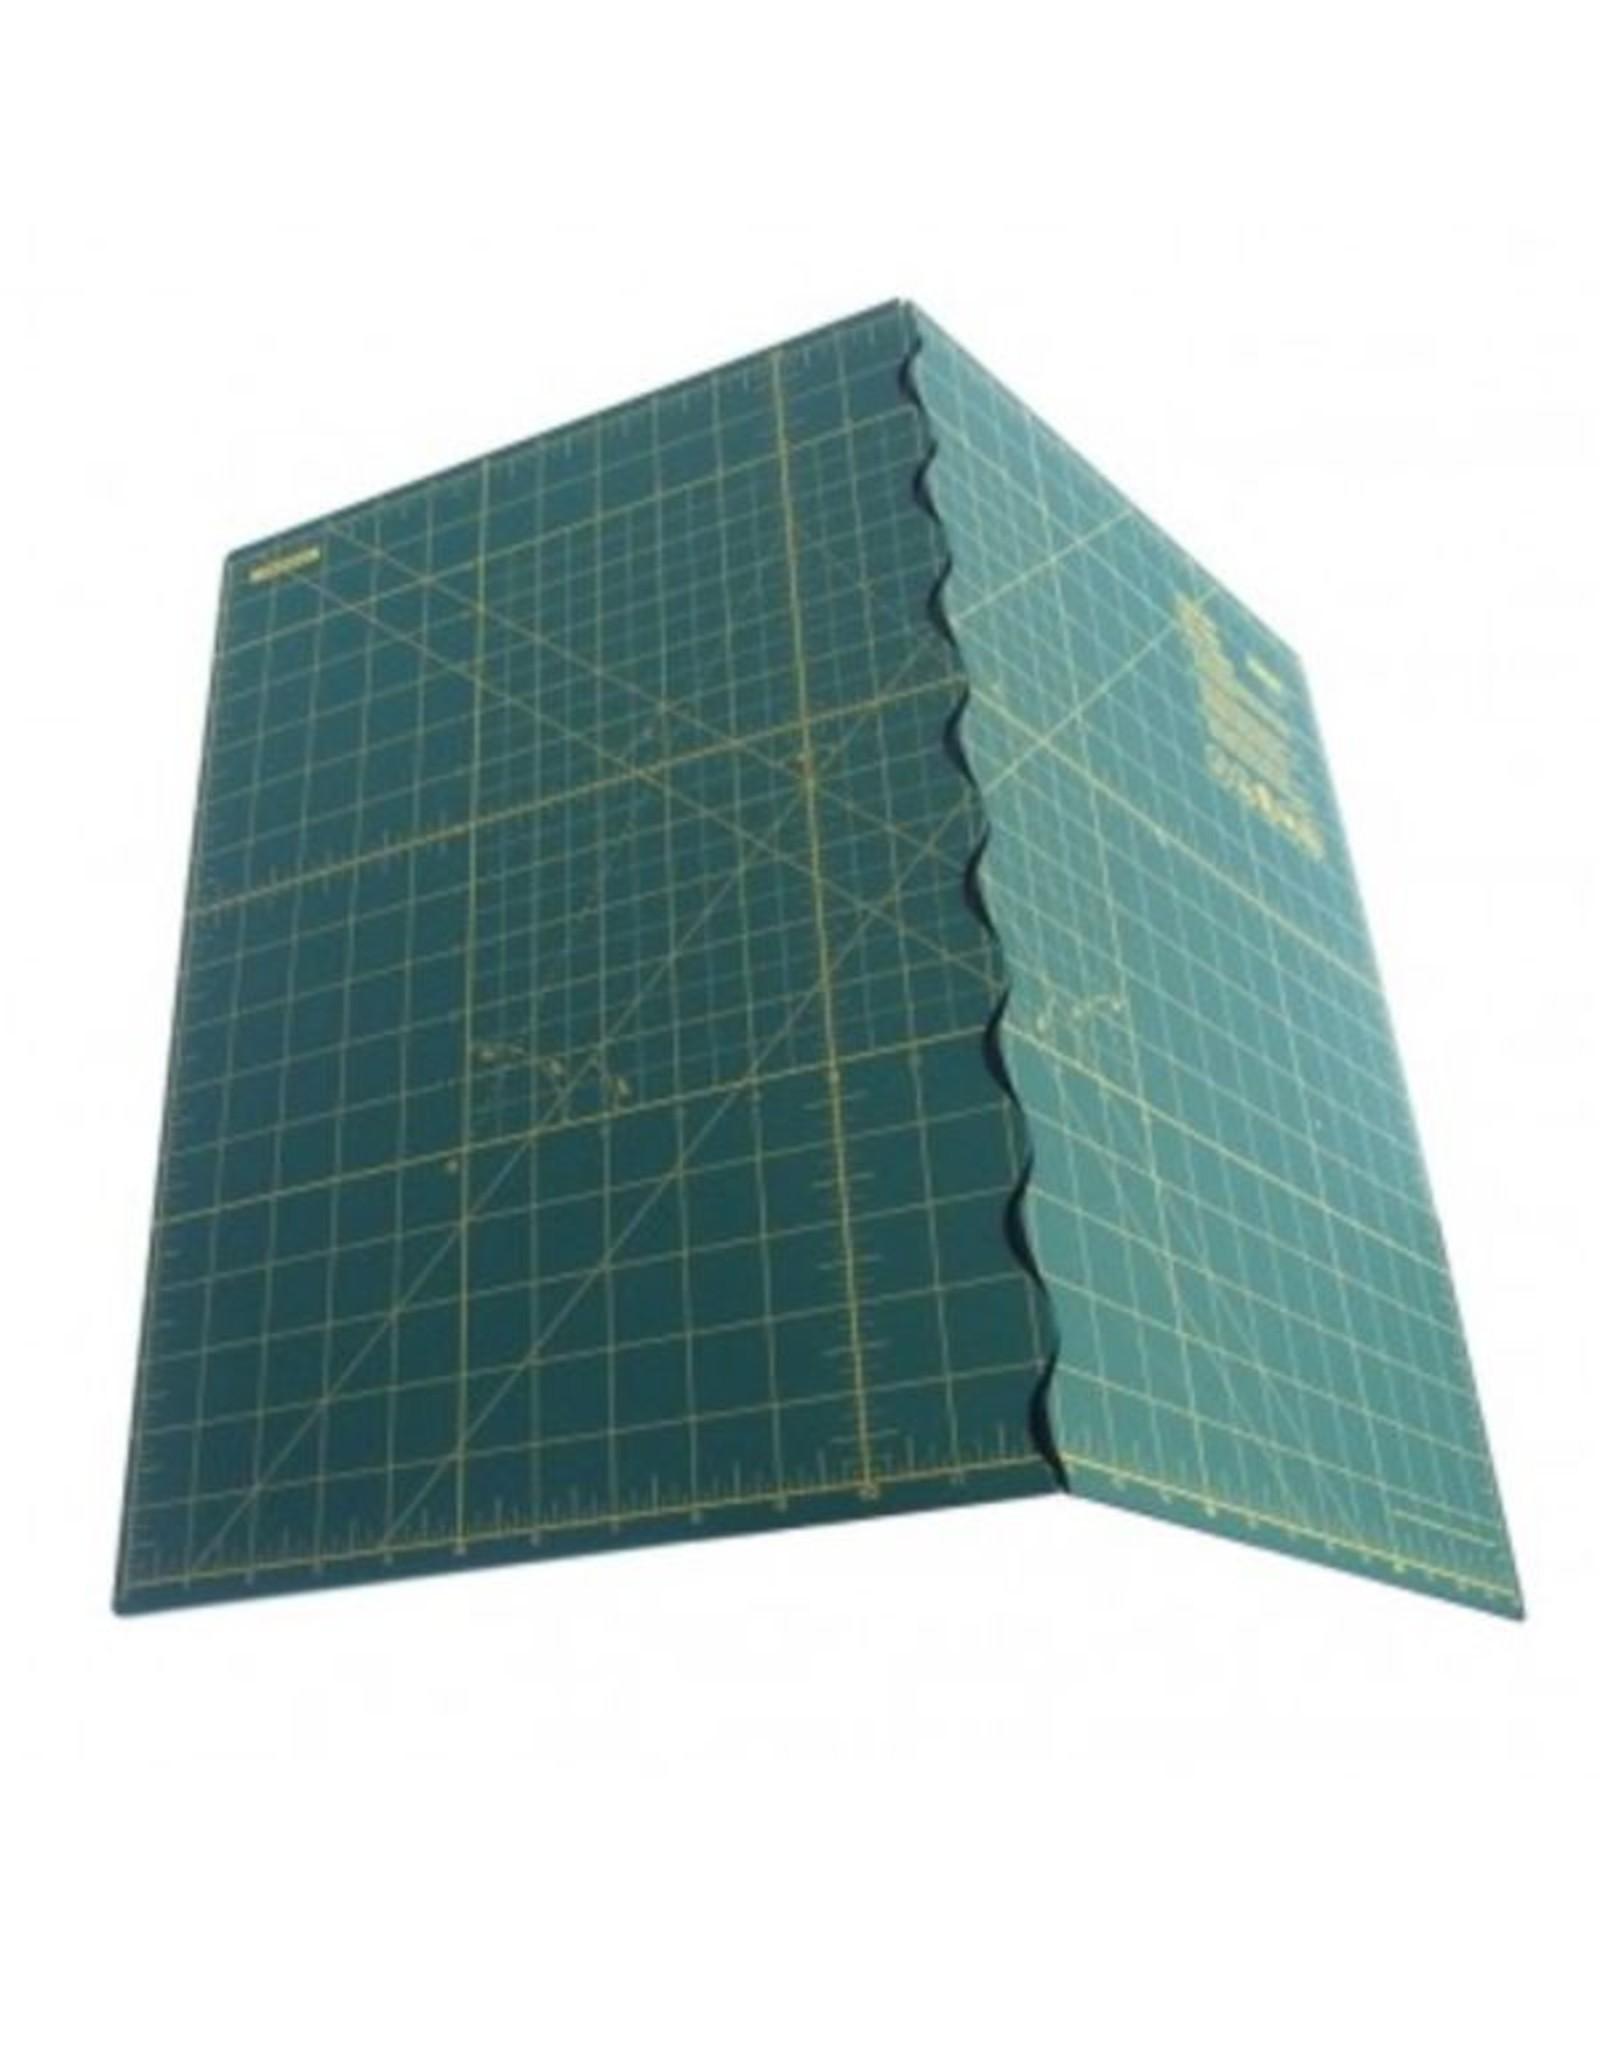 Olfa Olfa Snijmat - Opvouwbaar 12 x 17 inch